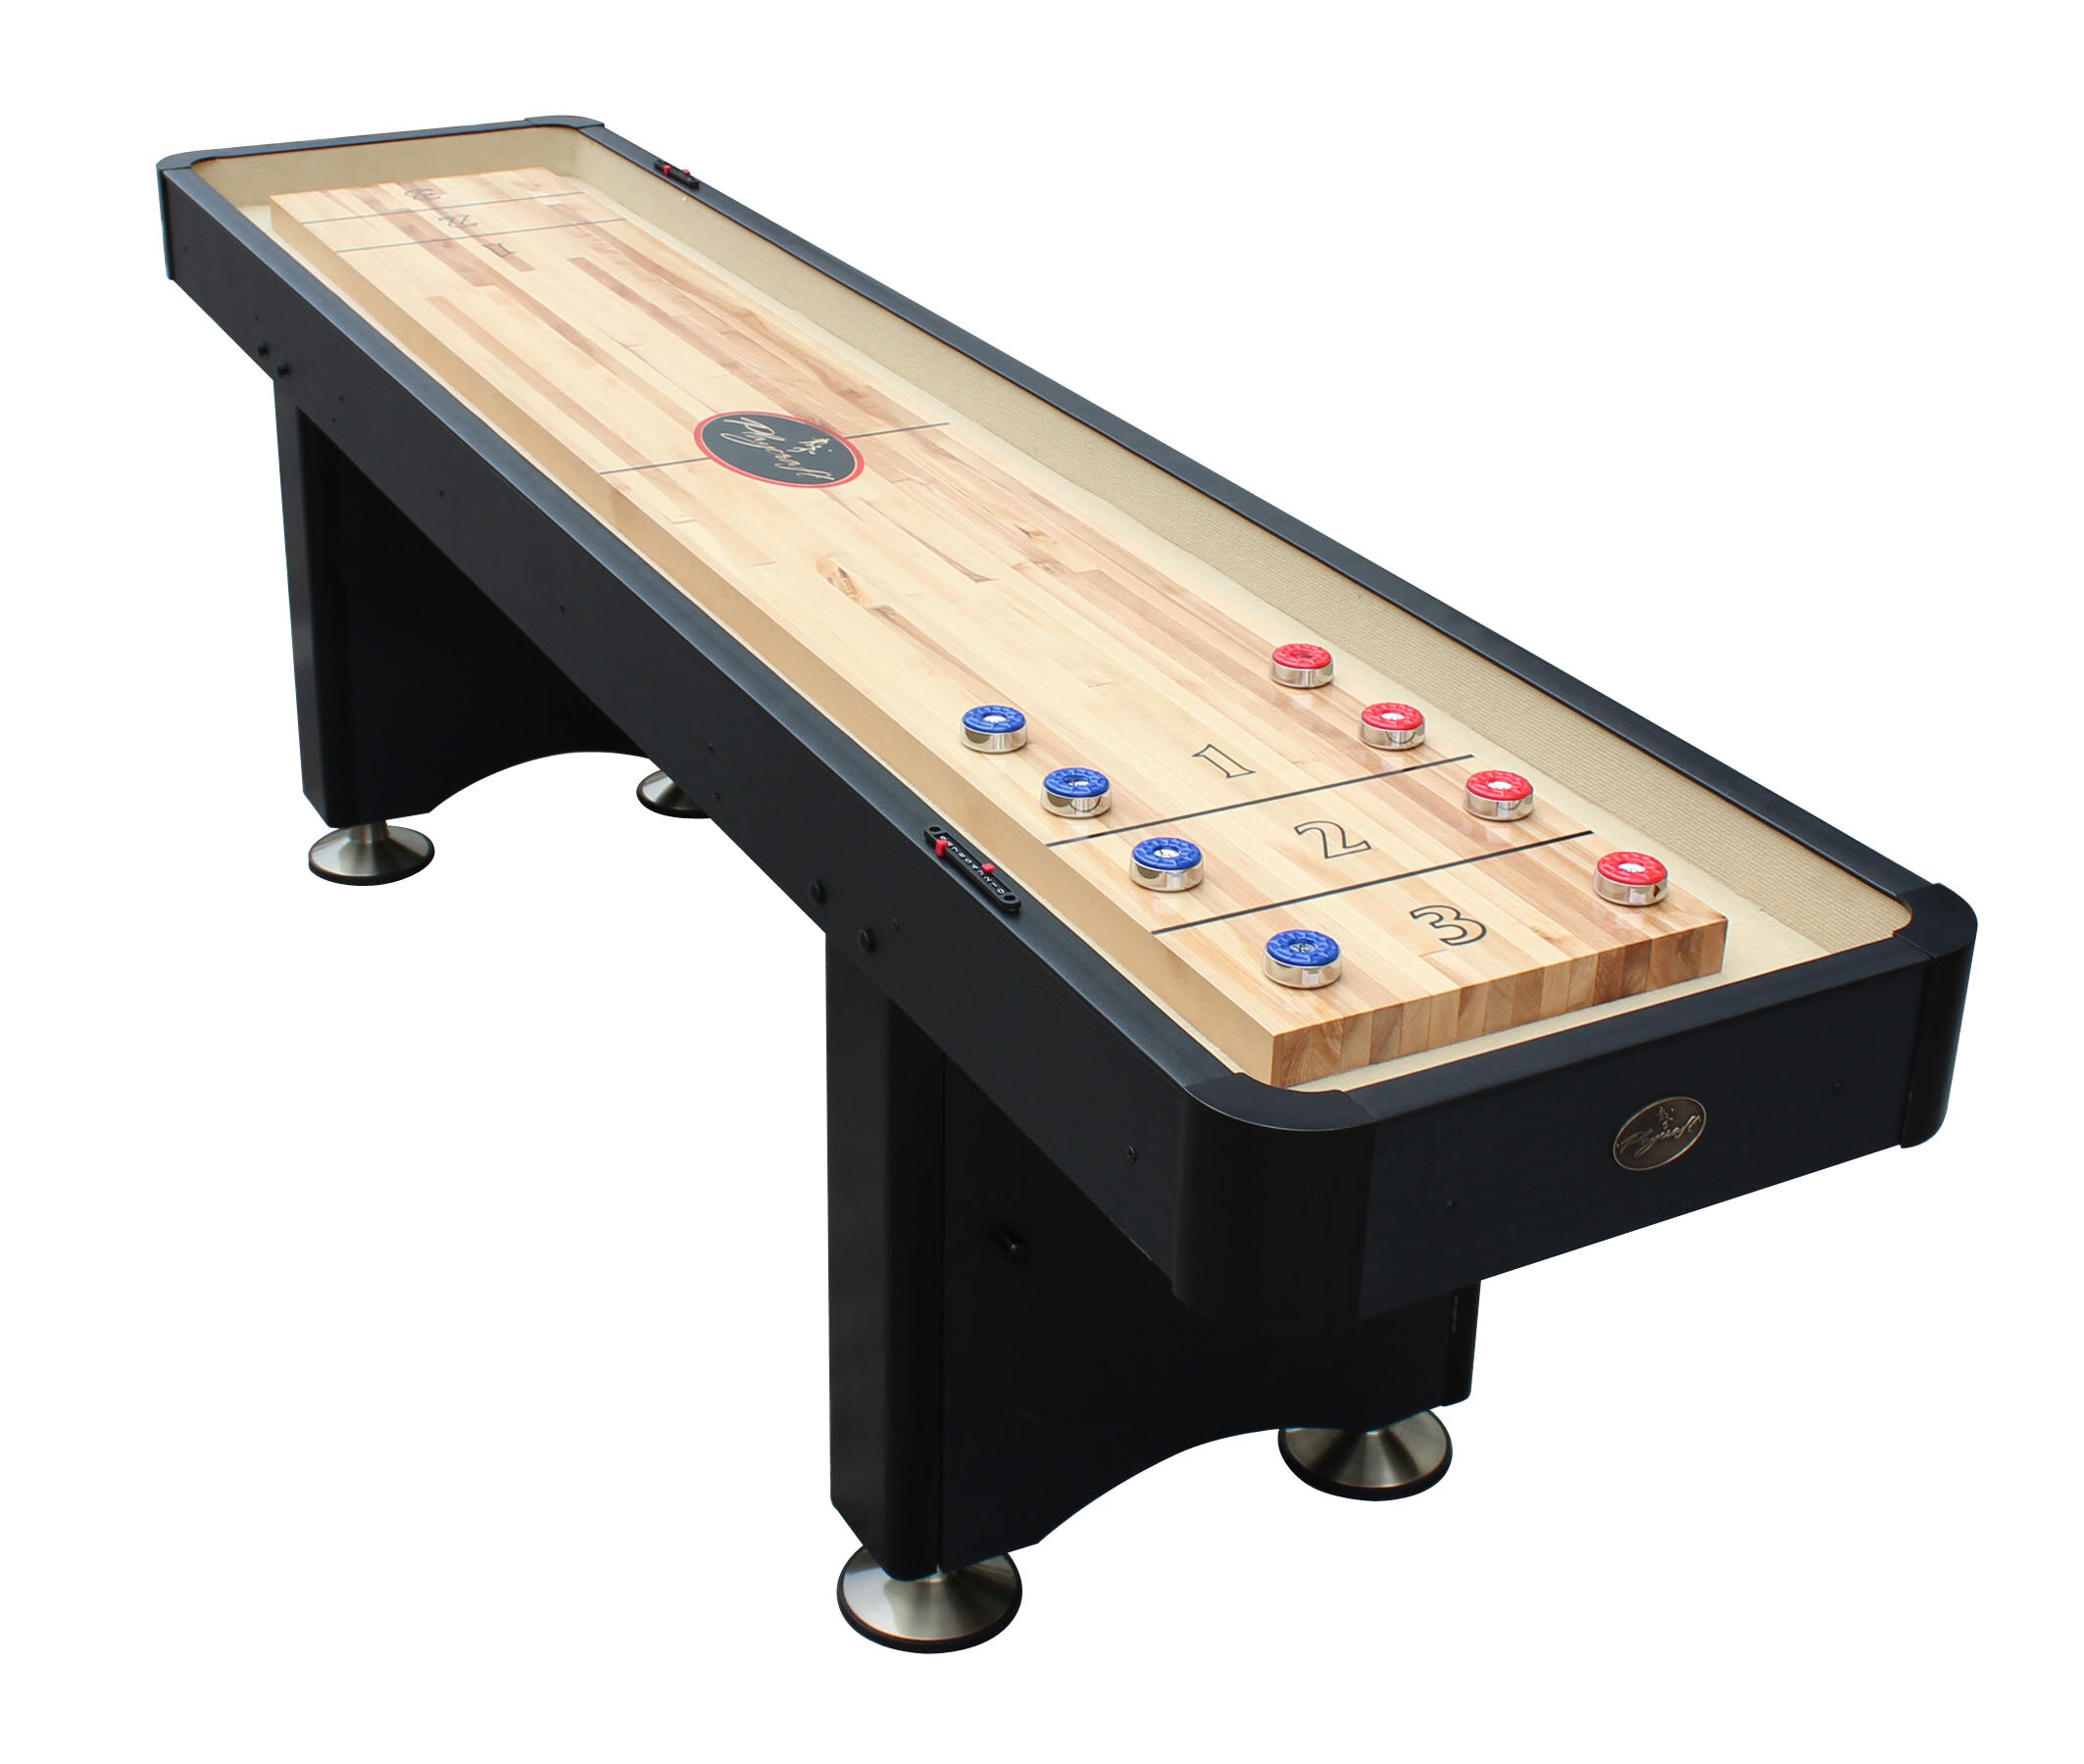 Fantastic Woodbridge Playcraft Shuffleboard Table Home Interior And Landscaping Mentranervesignezvosmurscom